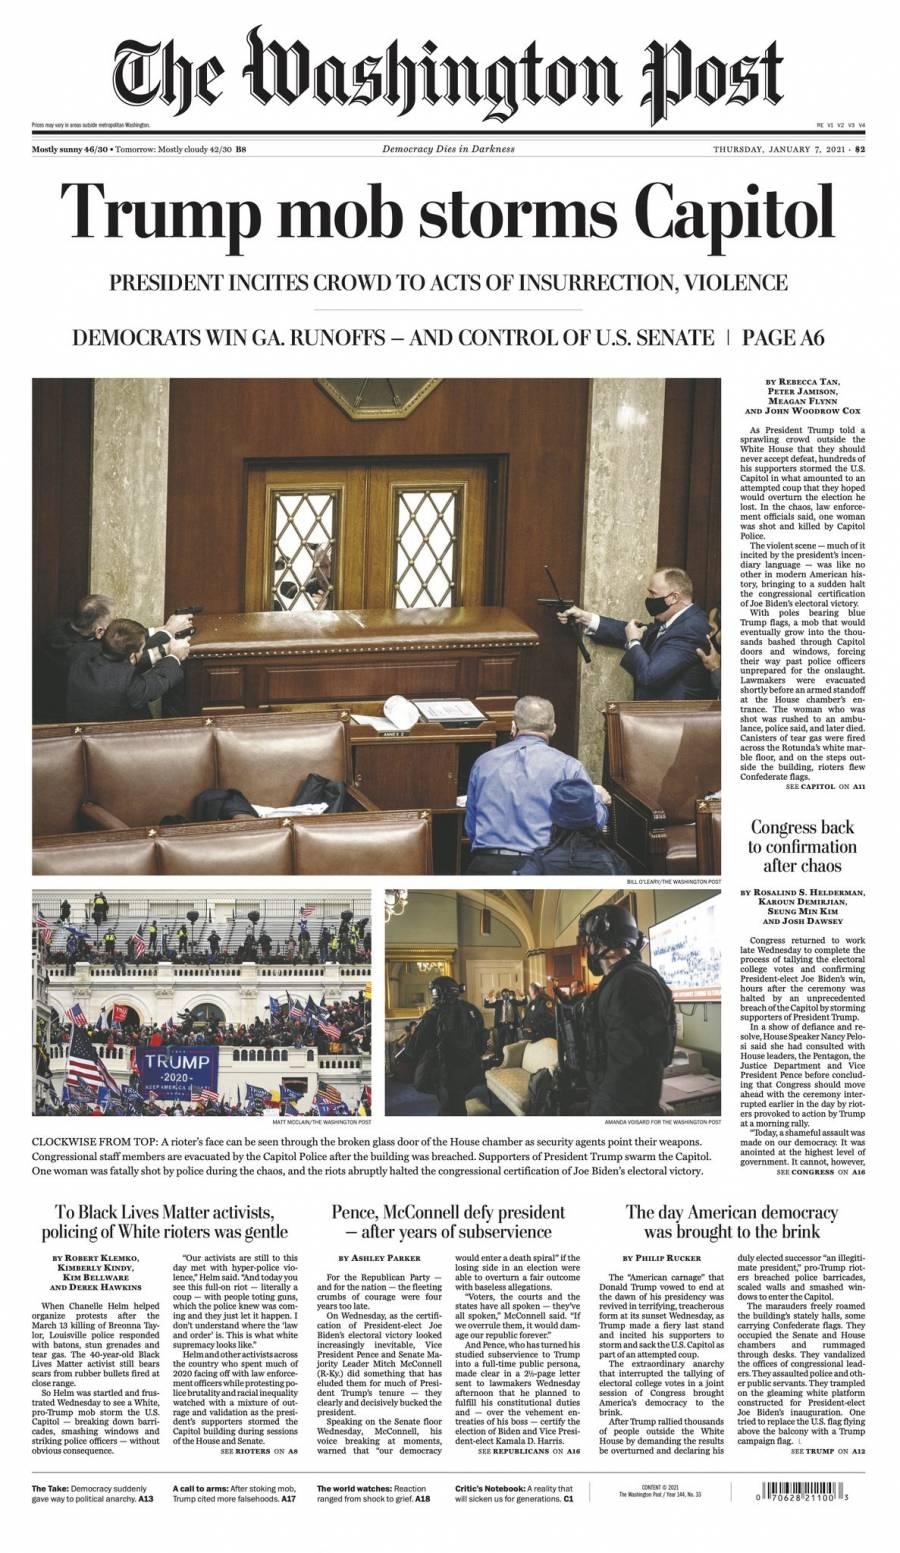 Pide Washington Post destitución de Donald Trump